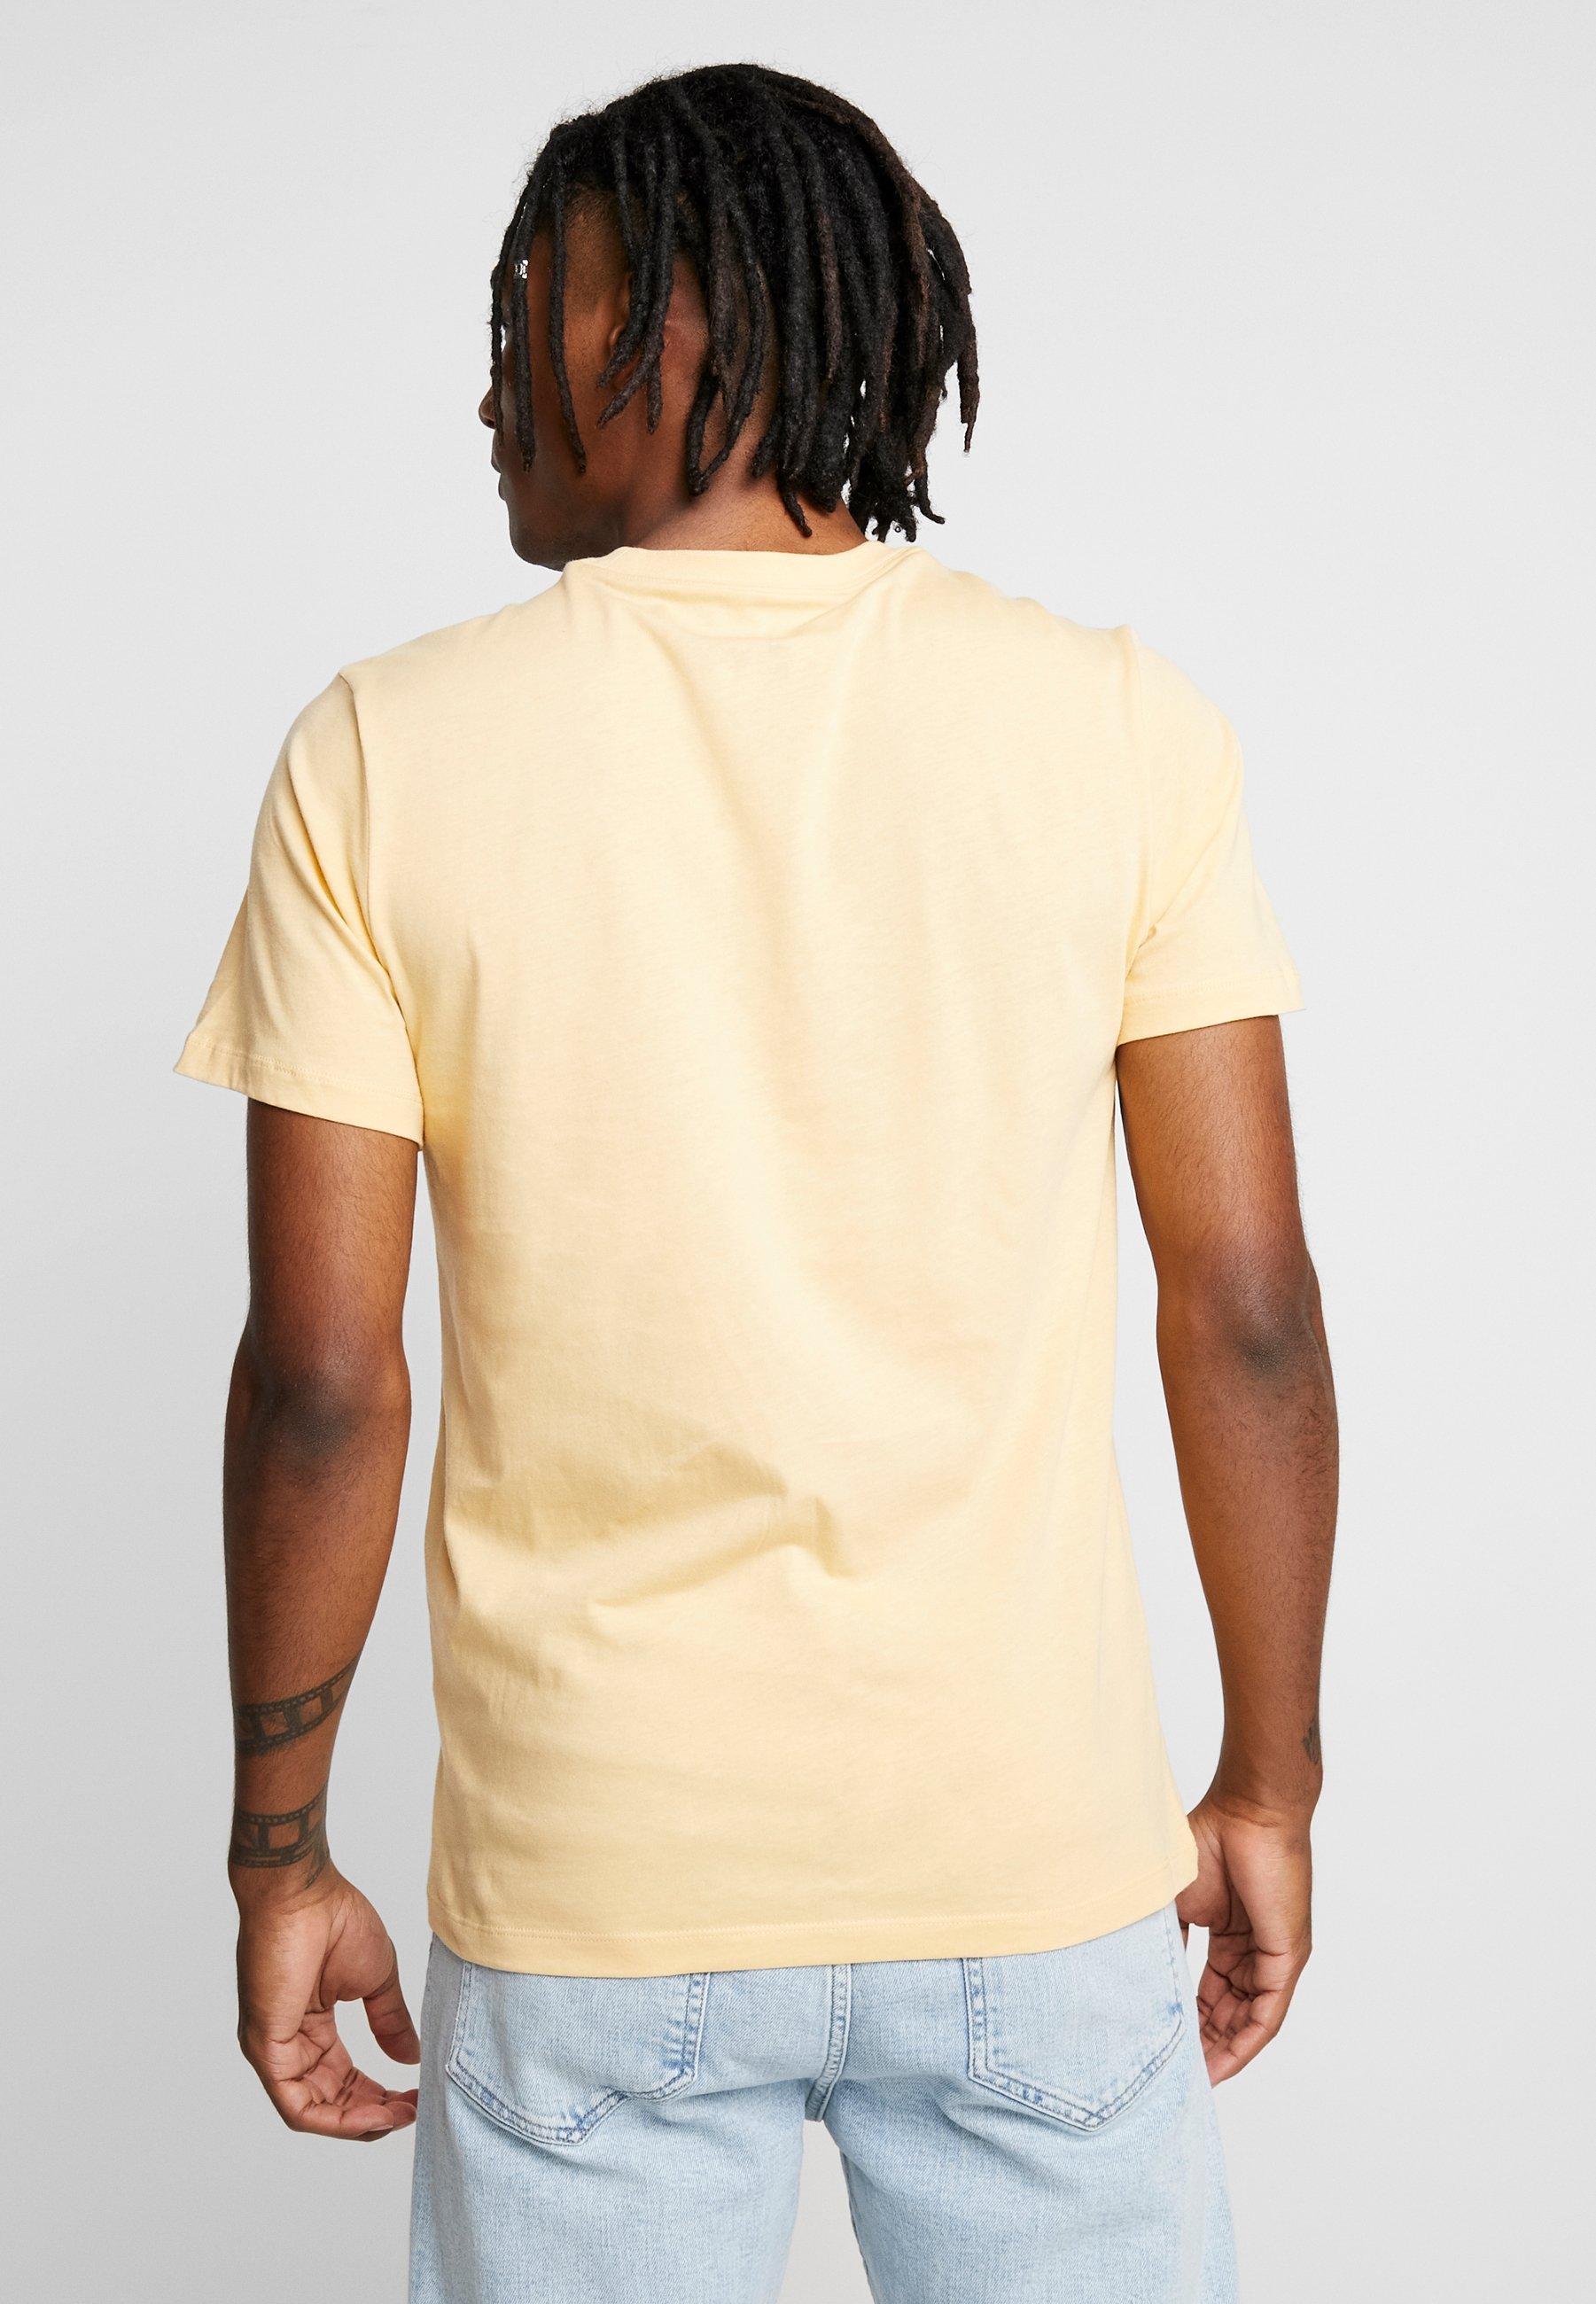 celestial LOGO CONCRETET SB Shirt gold Nike print UMSVzp